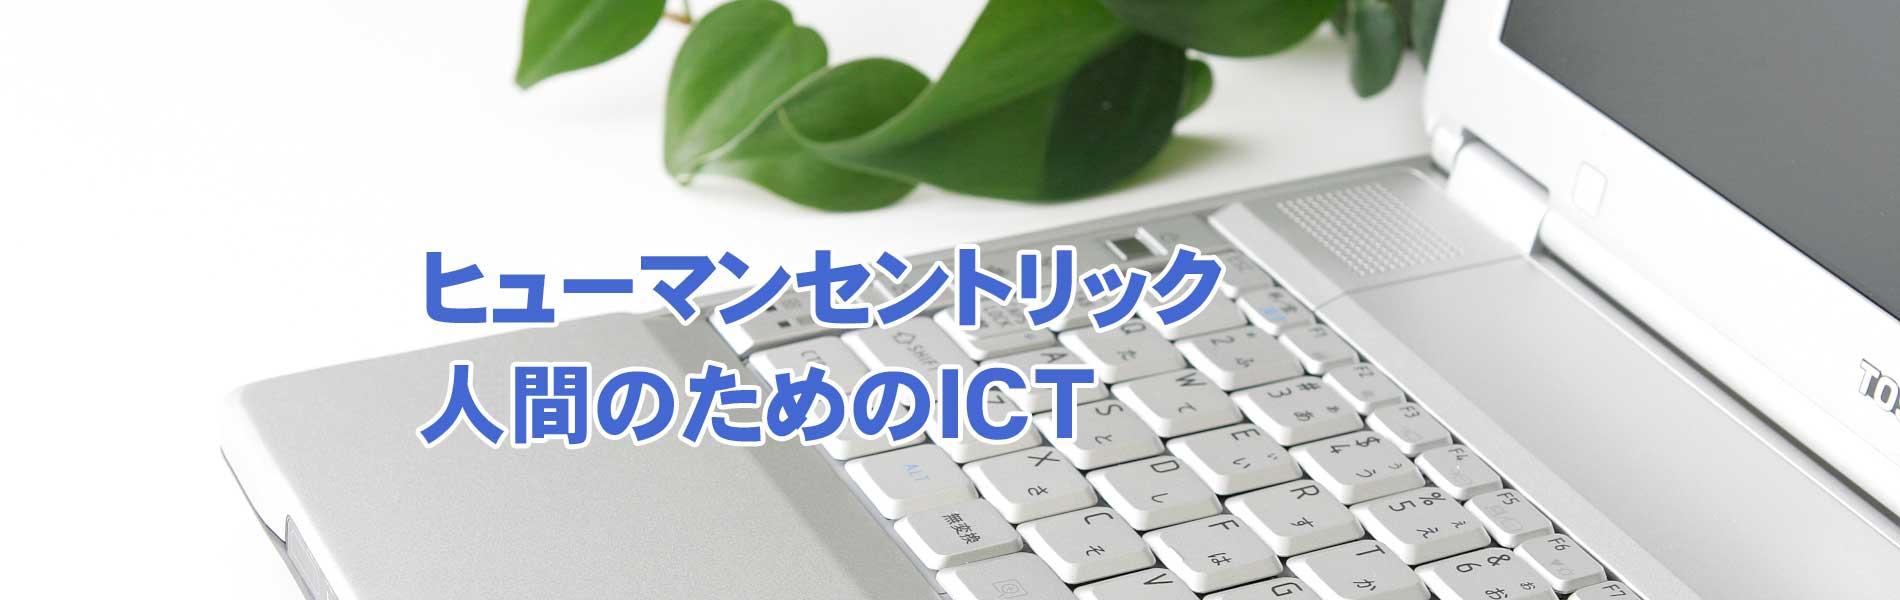 AB-Net.職業訓練,子ども,プログラミング